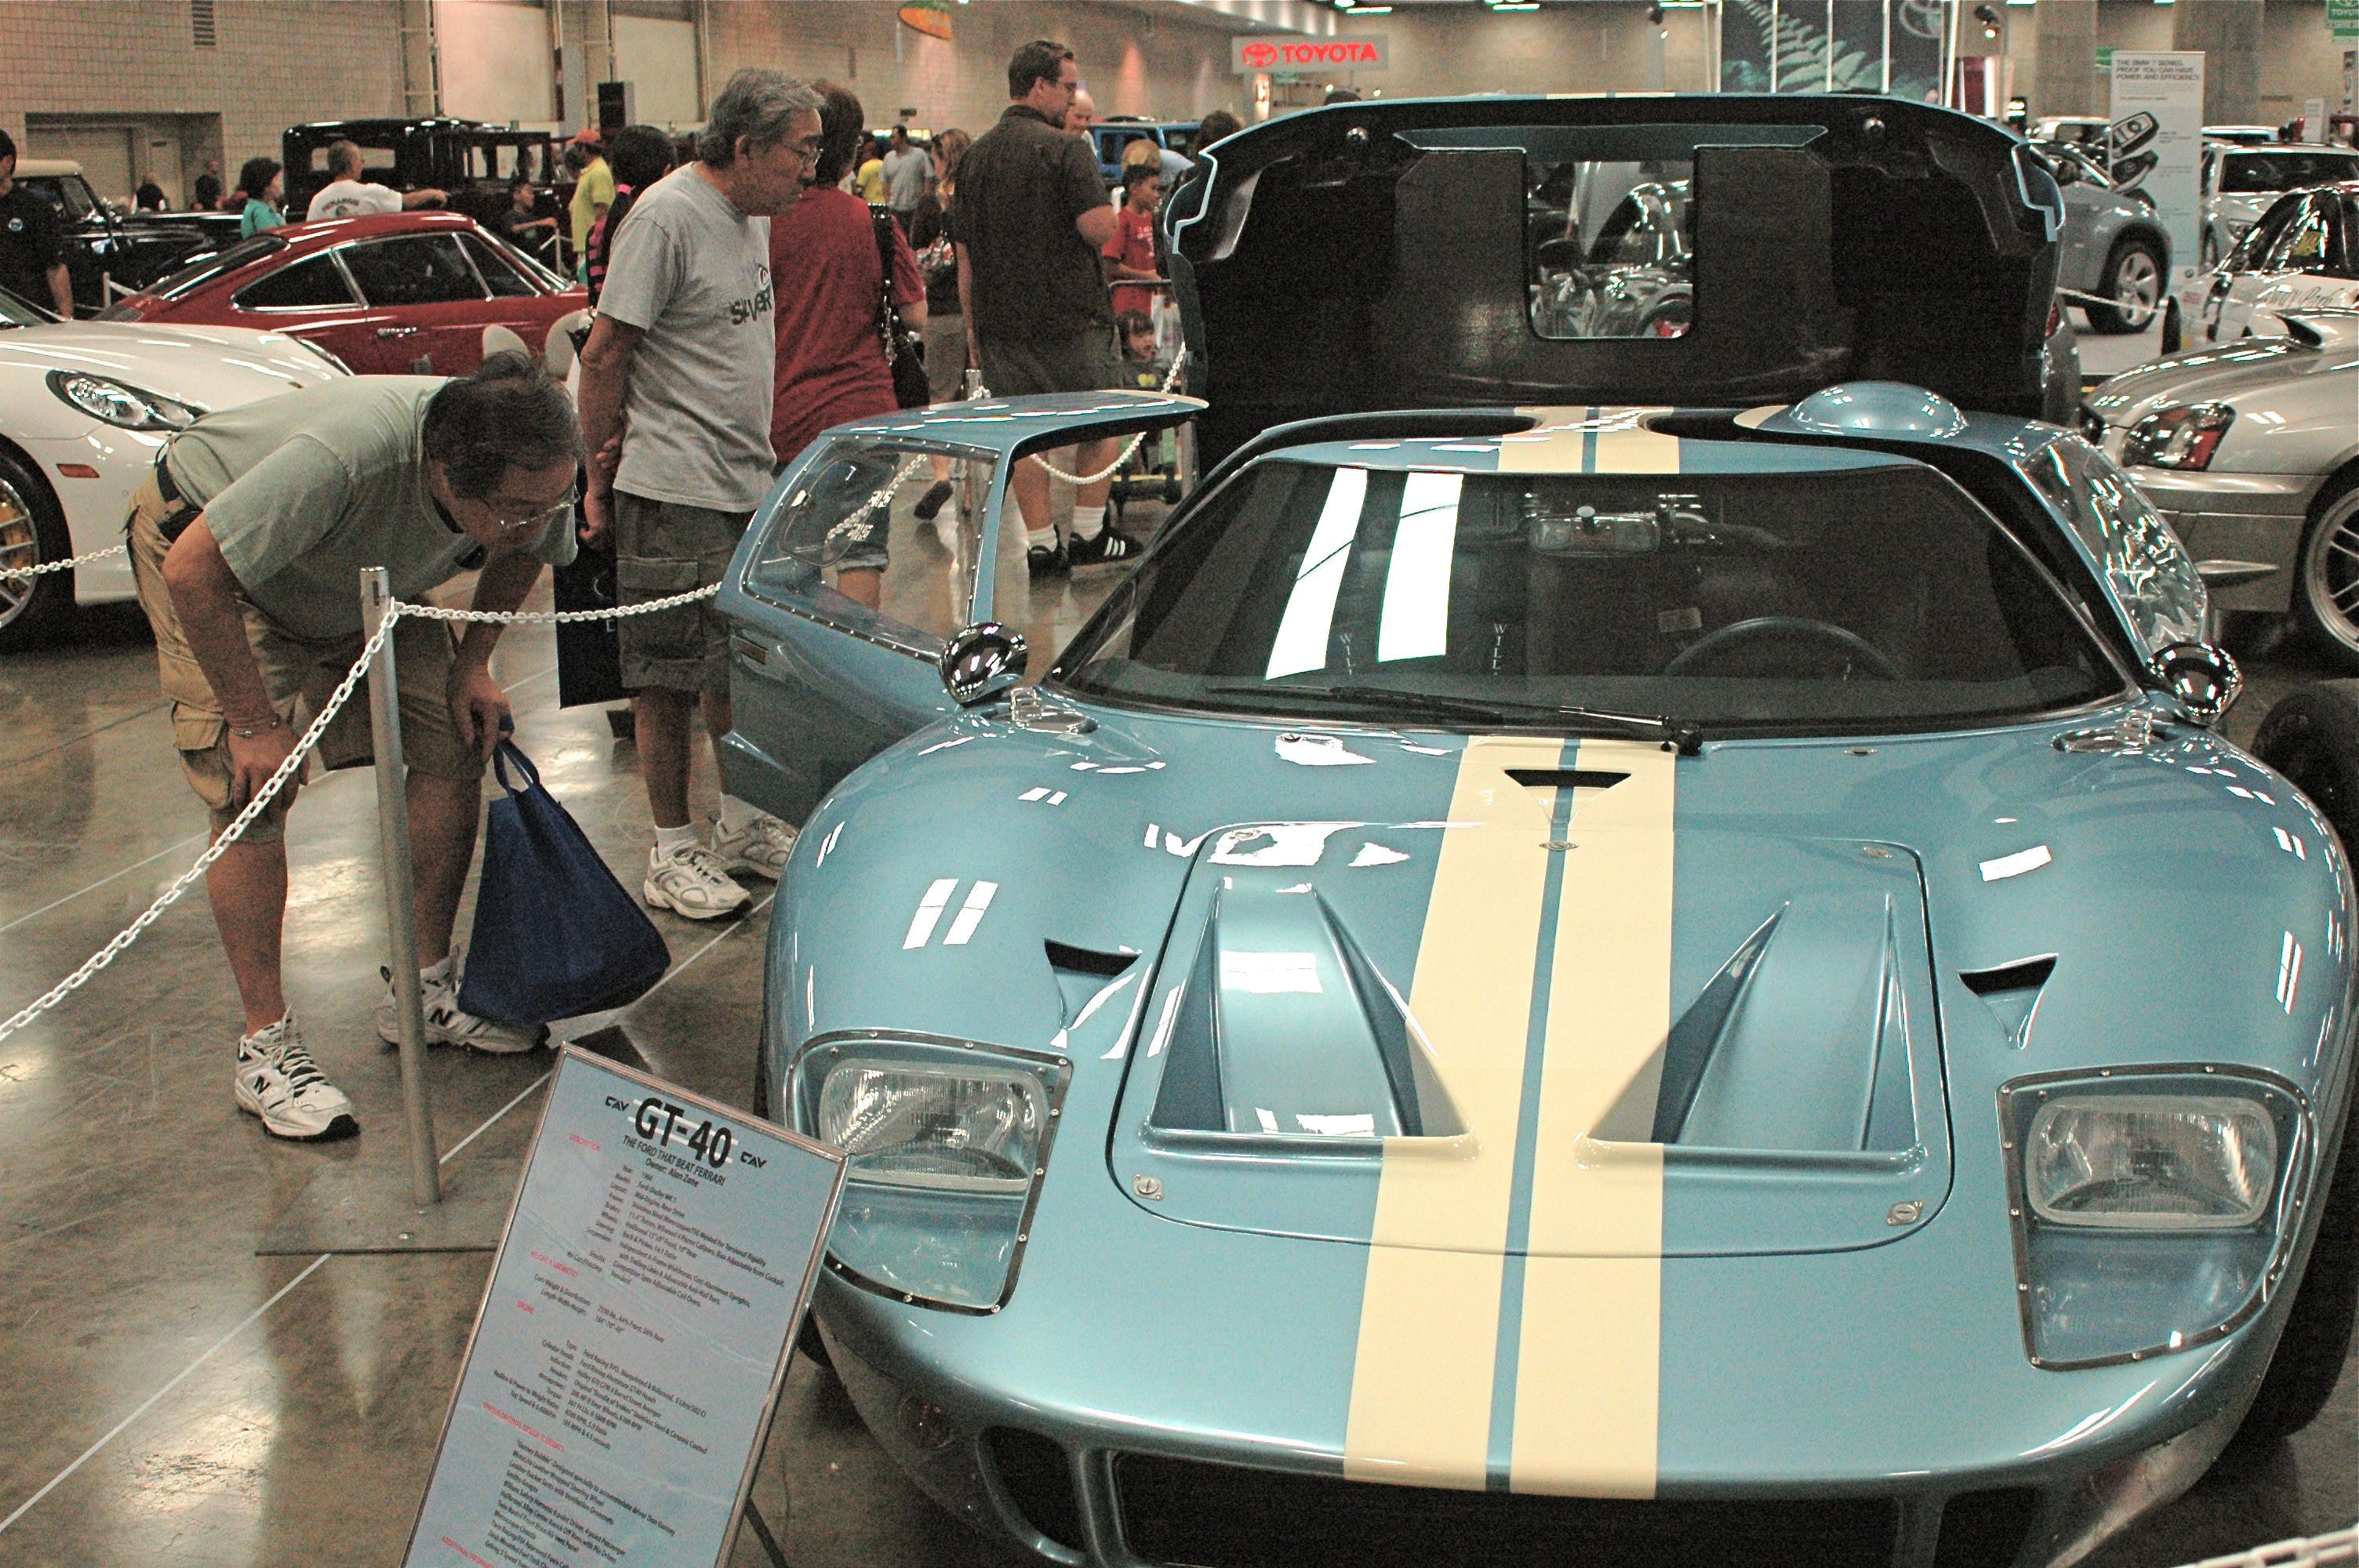 Honolulu Auto Show Cool Classic Cars Awe Spectators Article - Car show hawaii